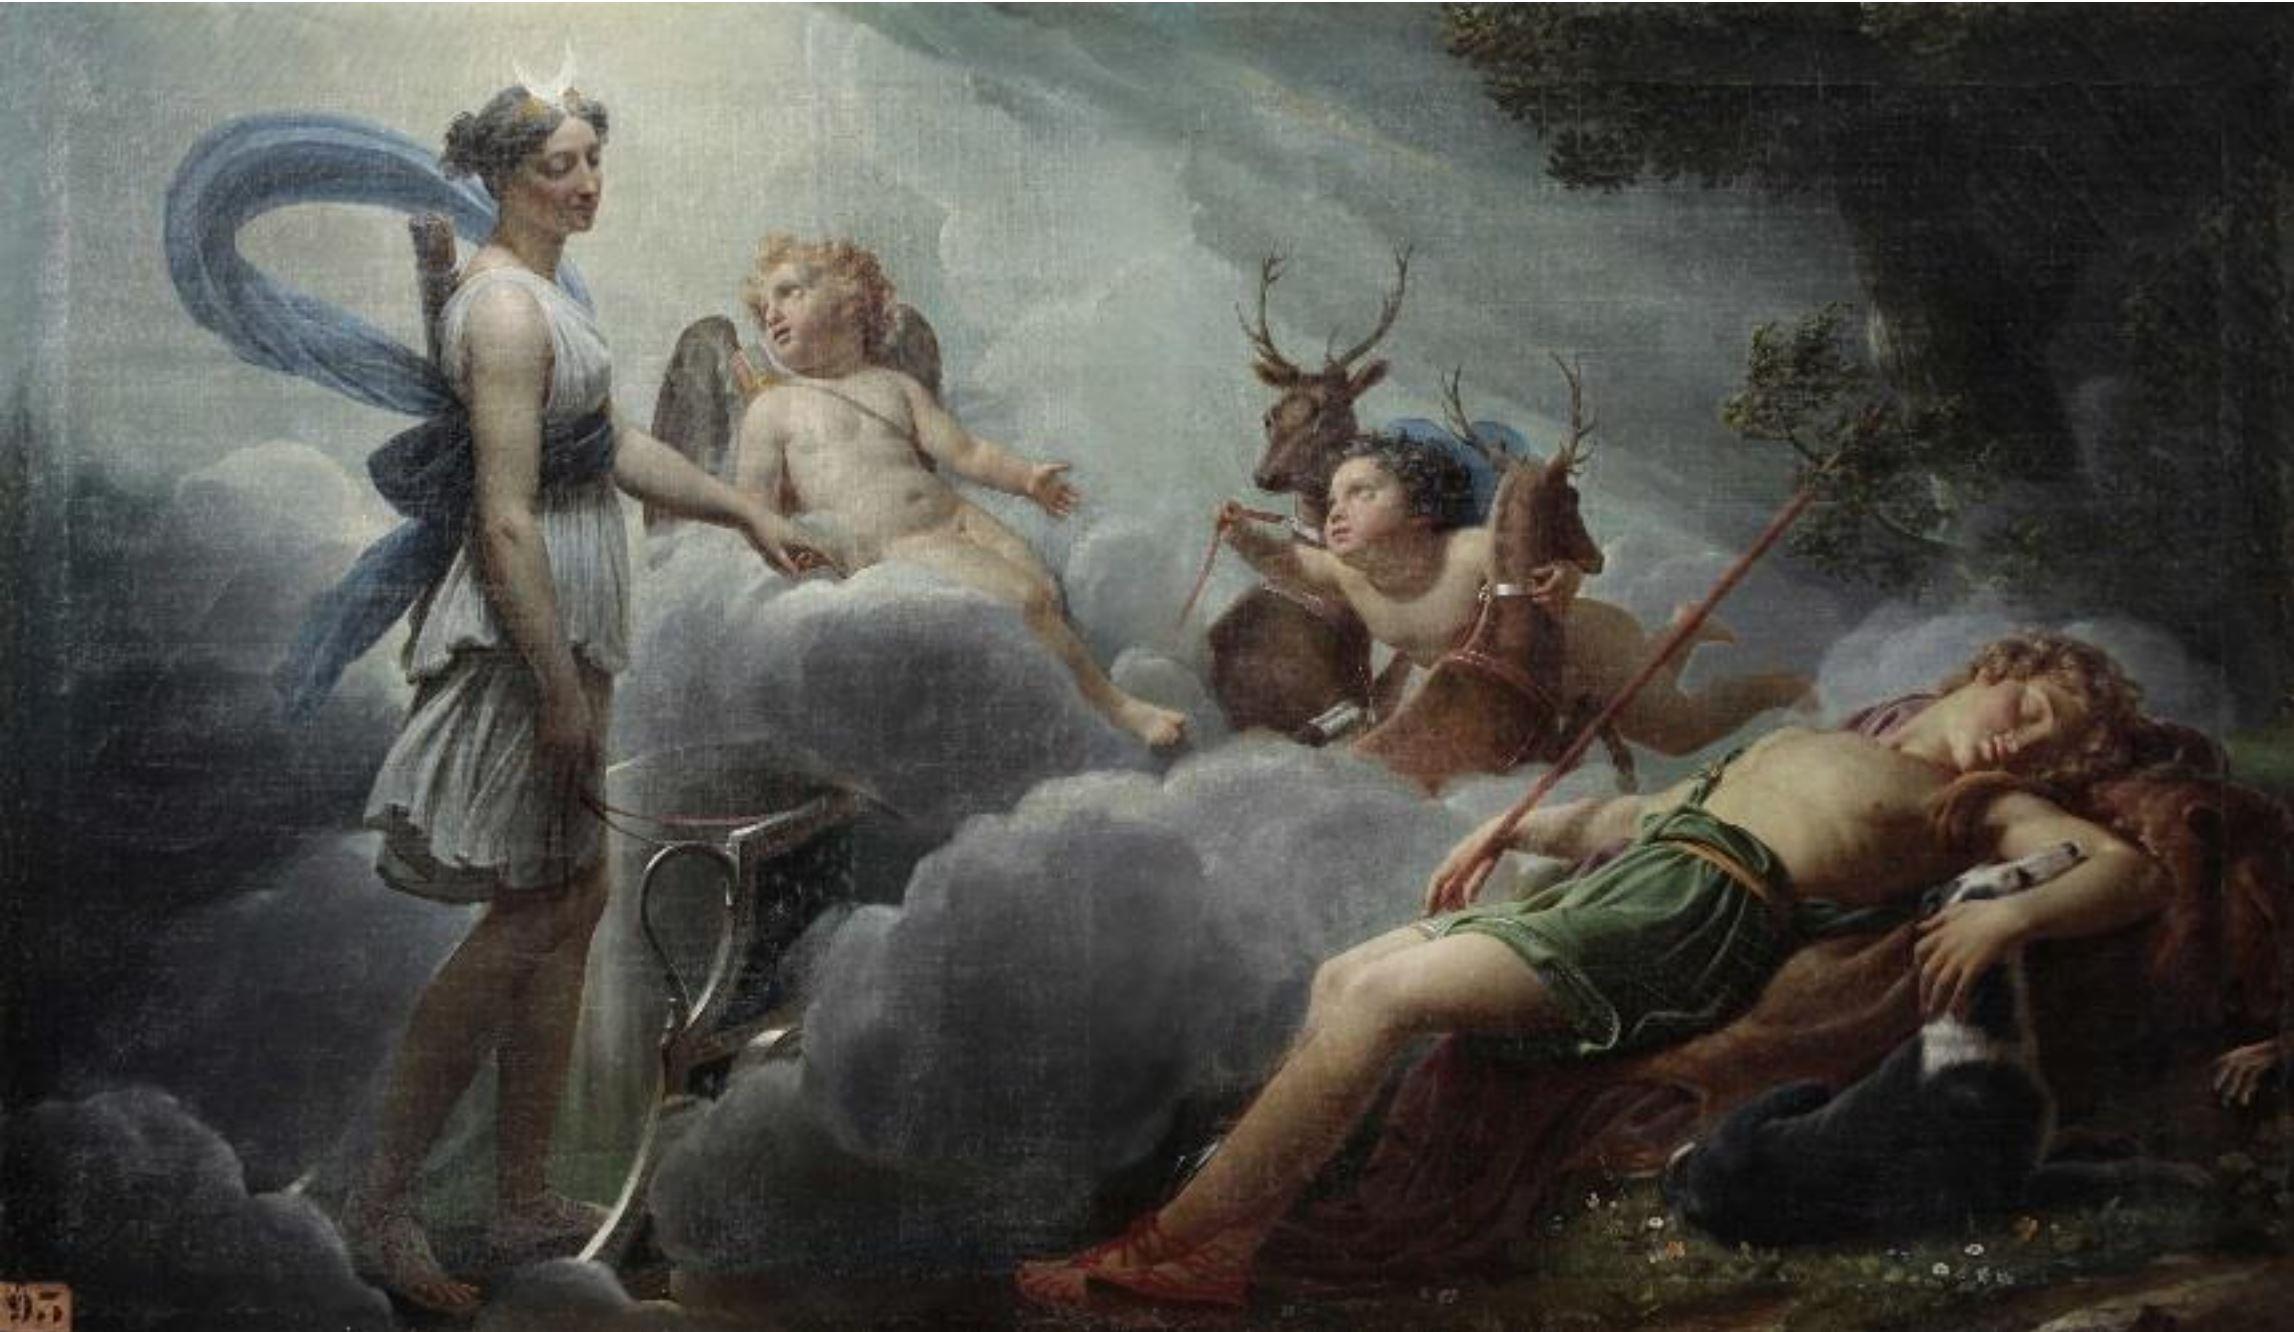 Hersent 1817 Diane et Endymion Musees E. Berry, Sens